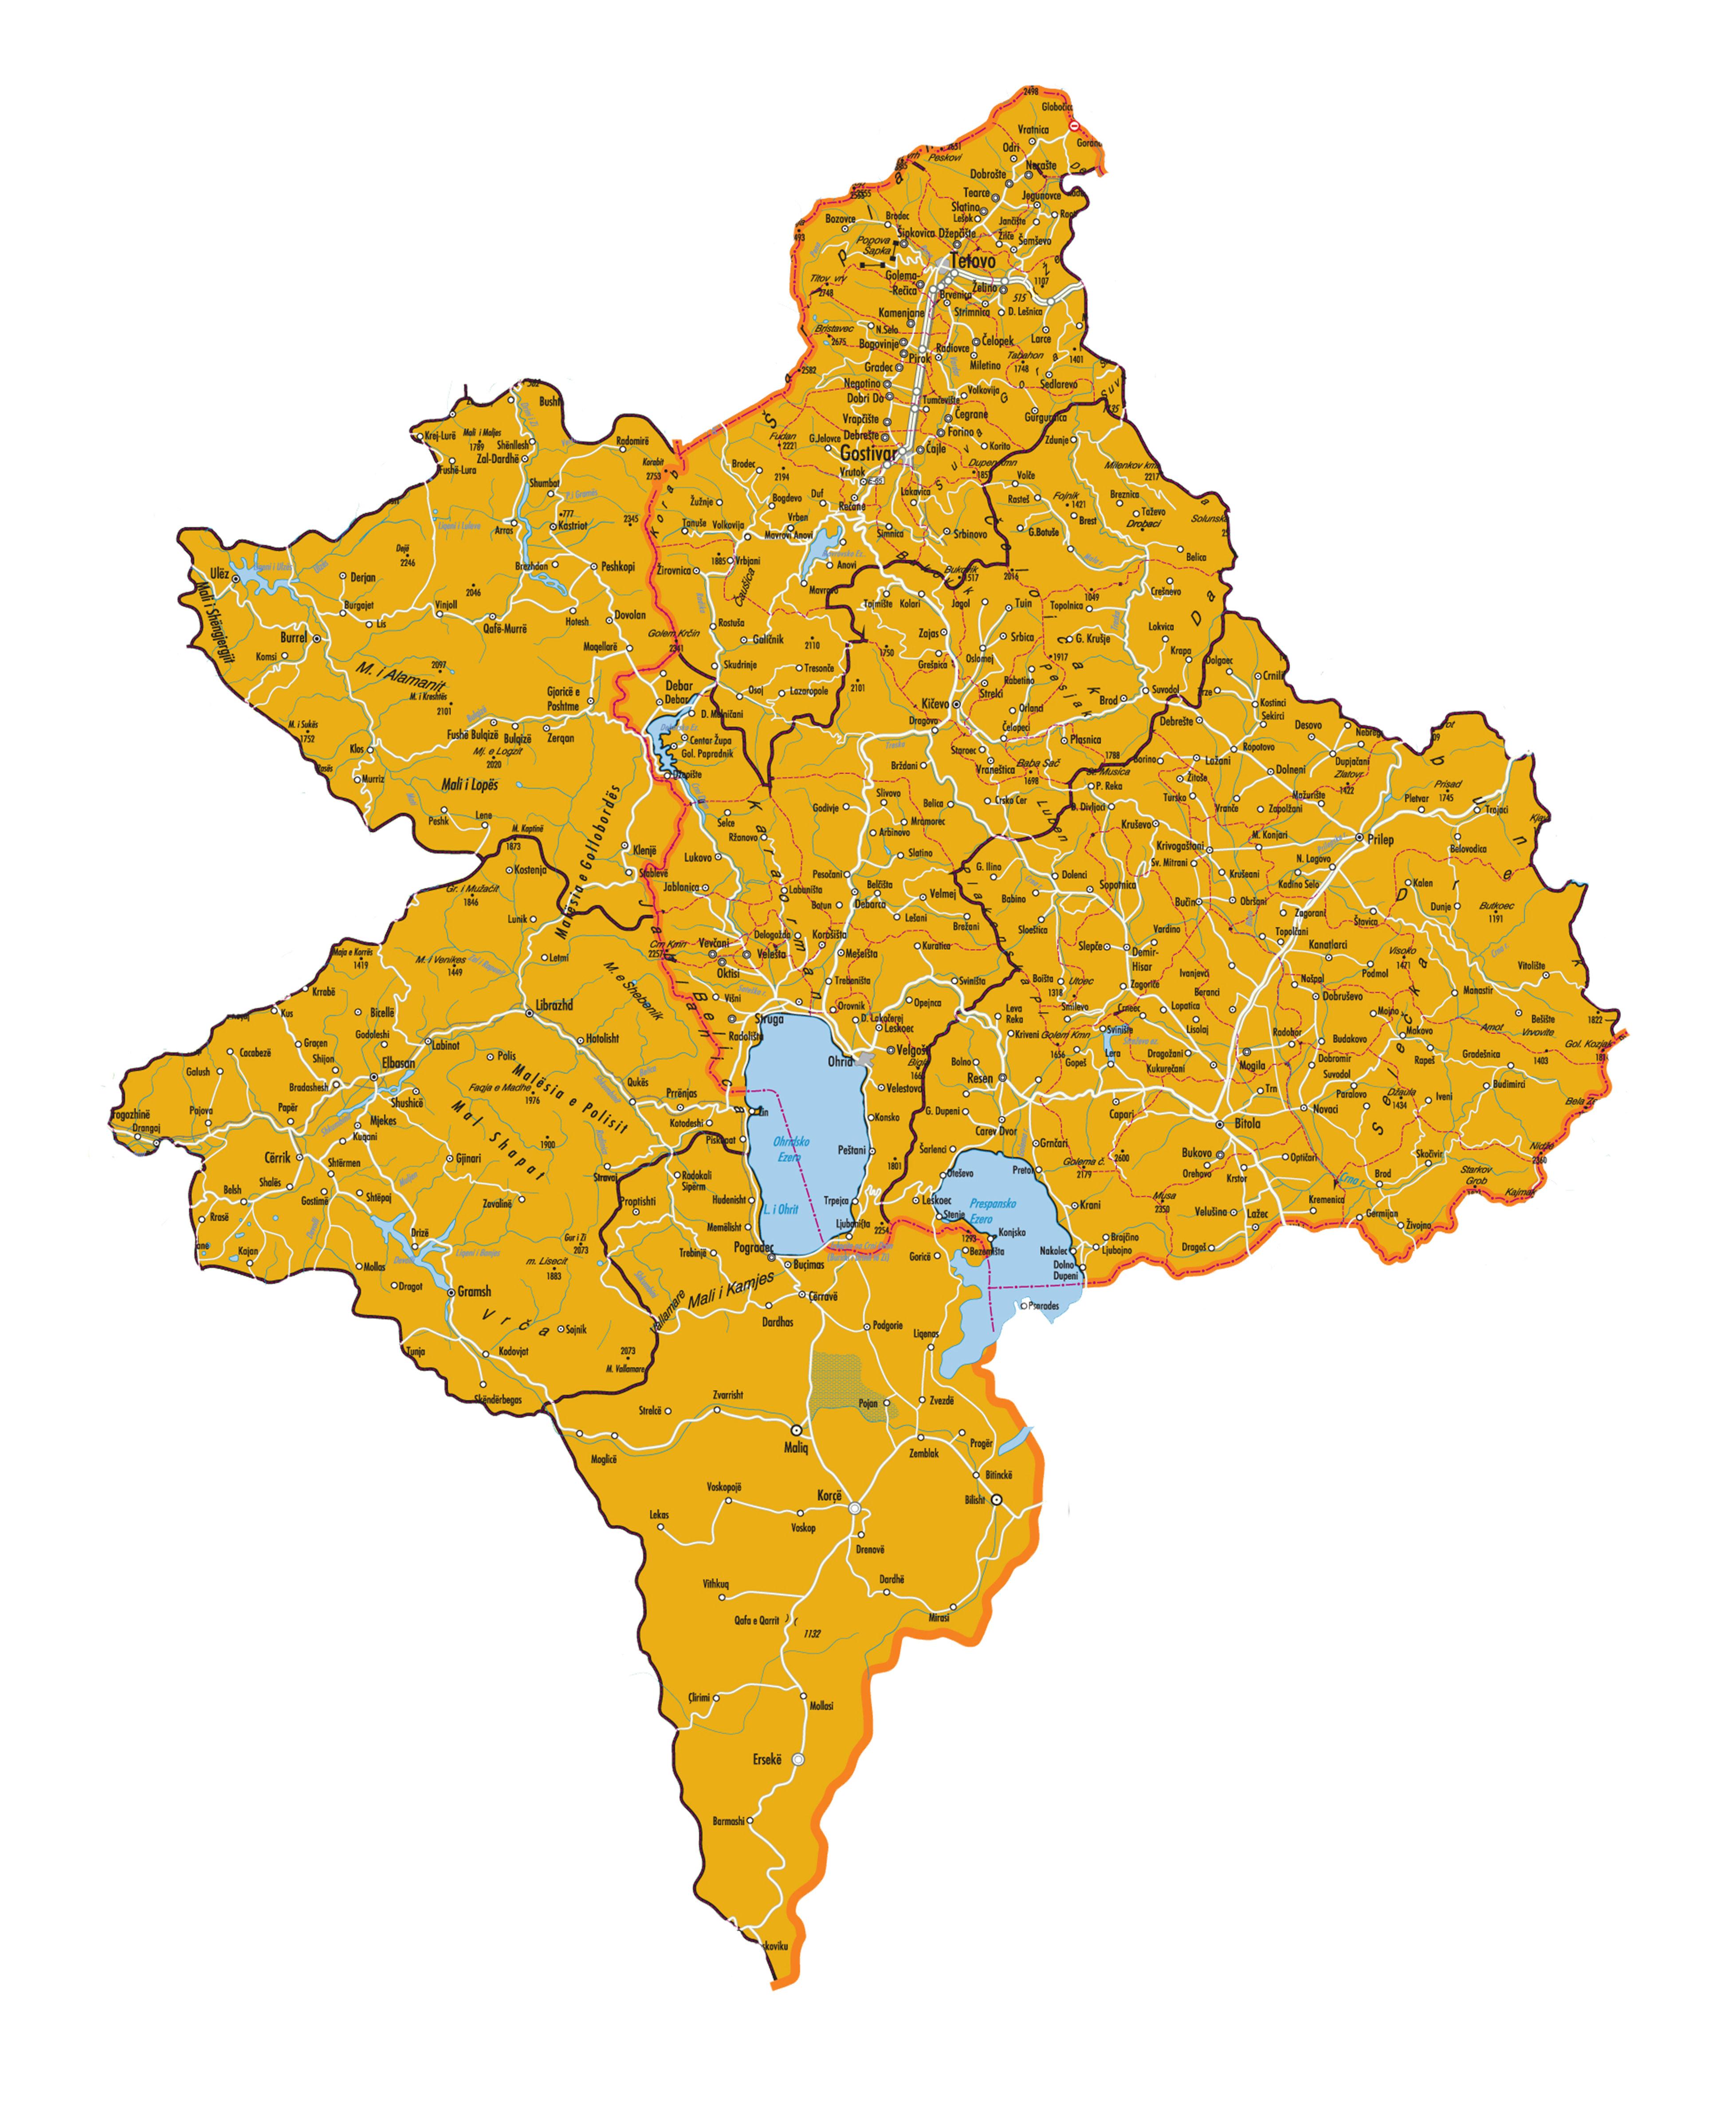 MK-AL (North Macedonia – Albania)